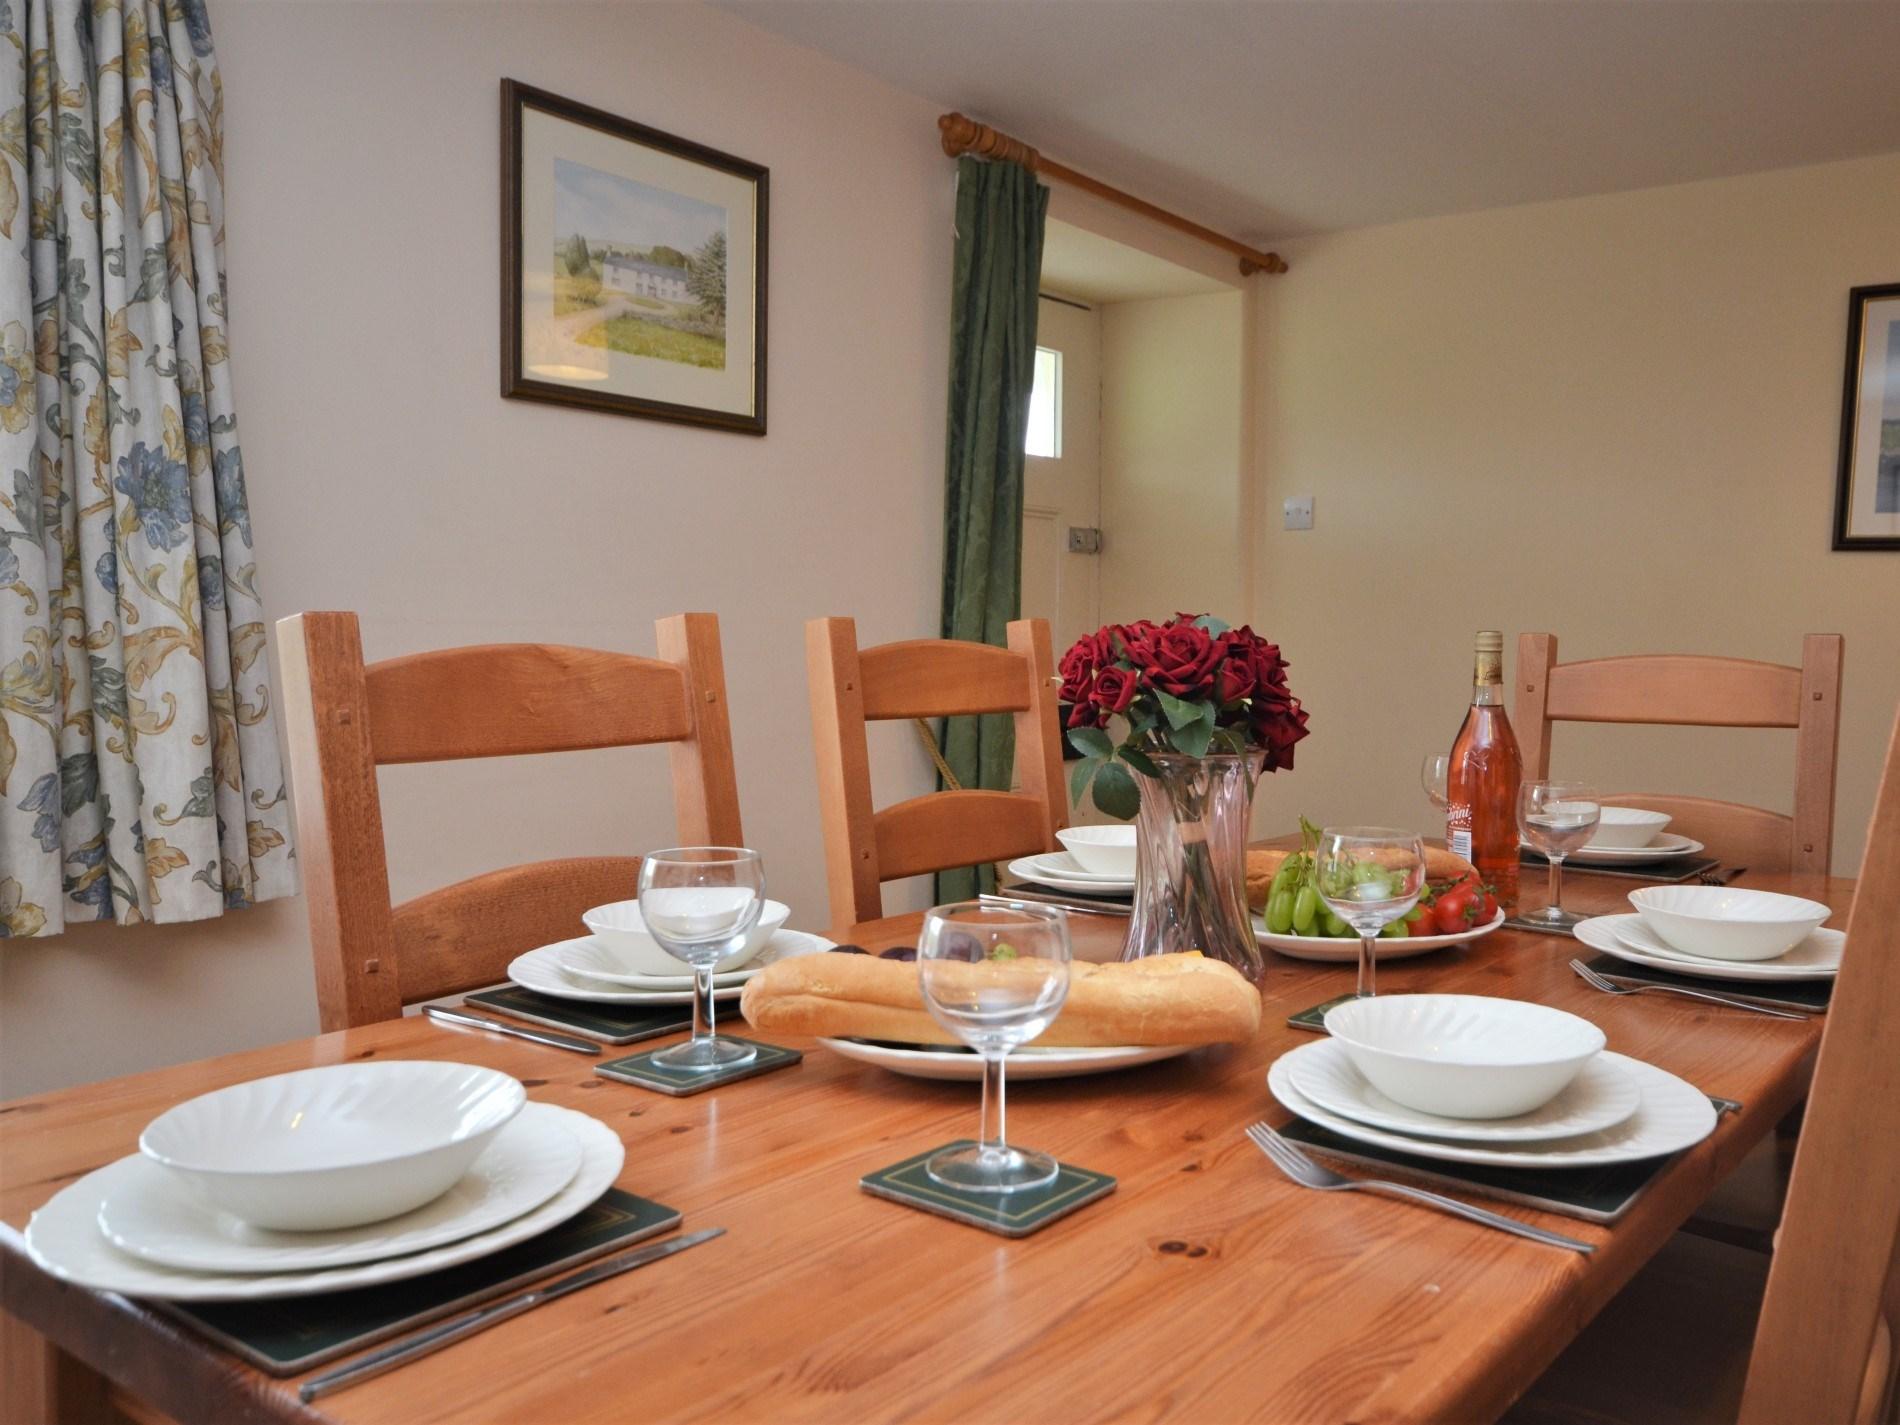 6 Bedroom House in South Devon, Devon